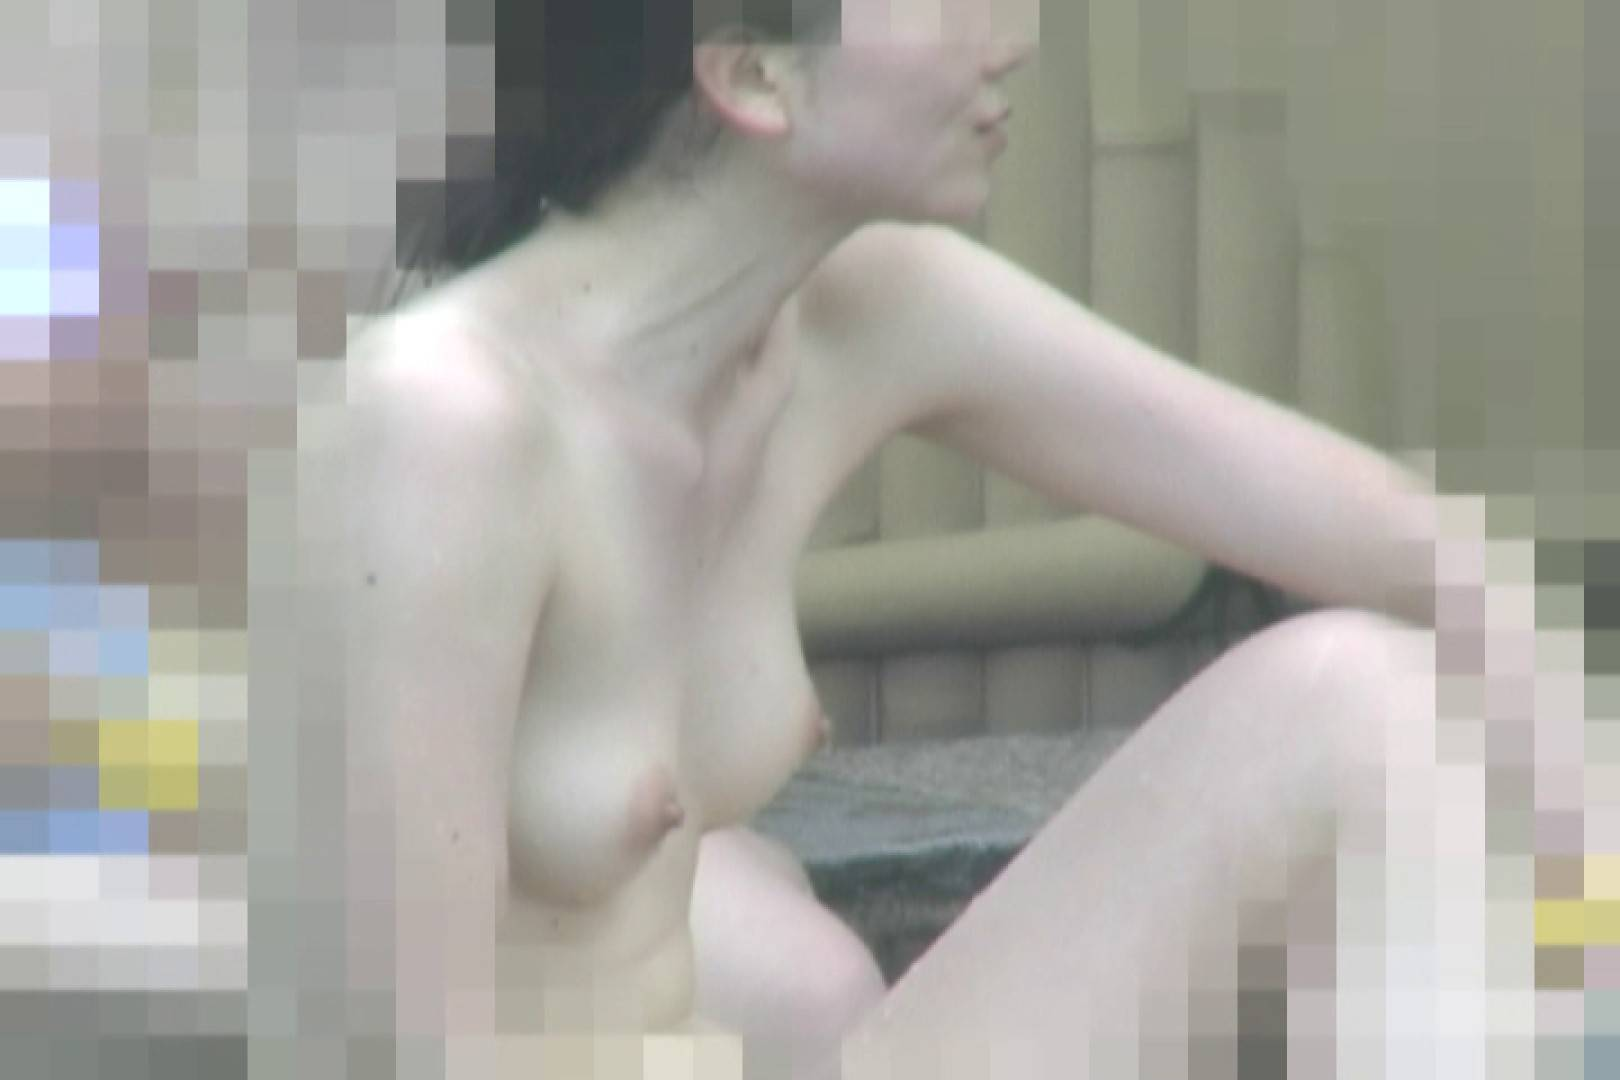 Aquaな露天風呂Vol.835 盗撮 | HなOL  73pic 58